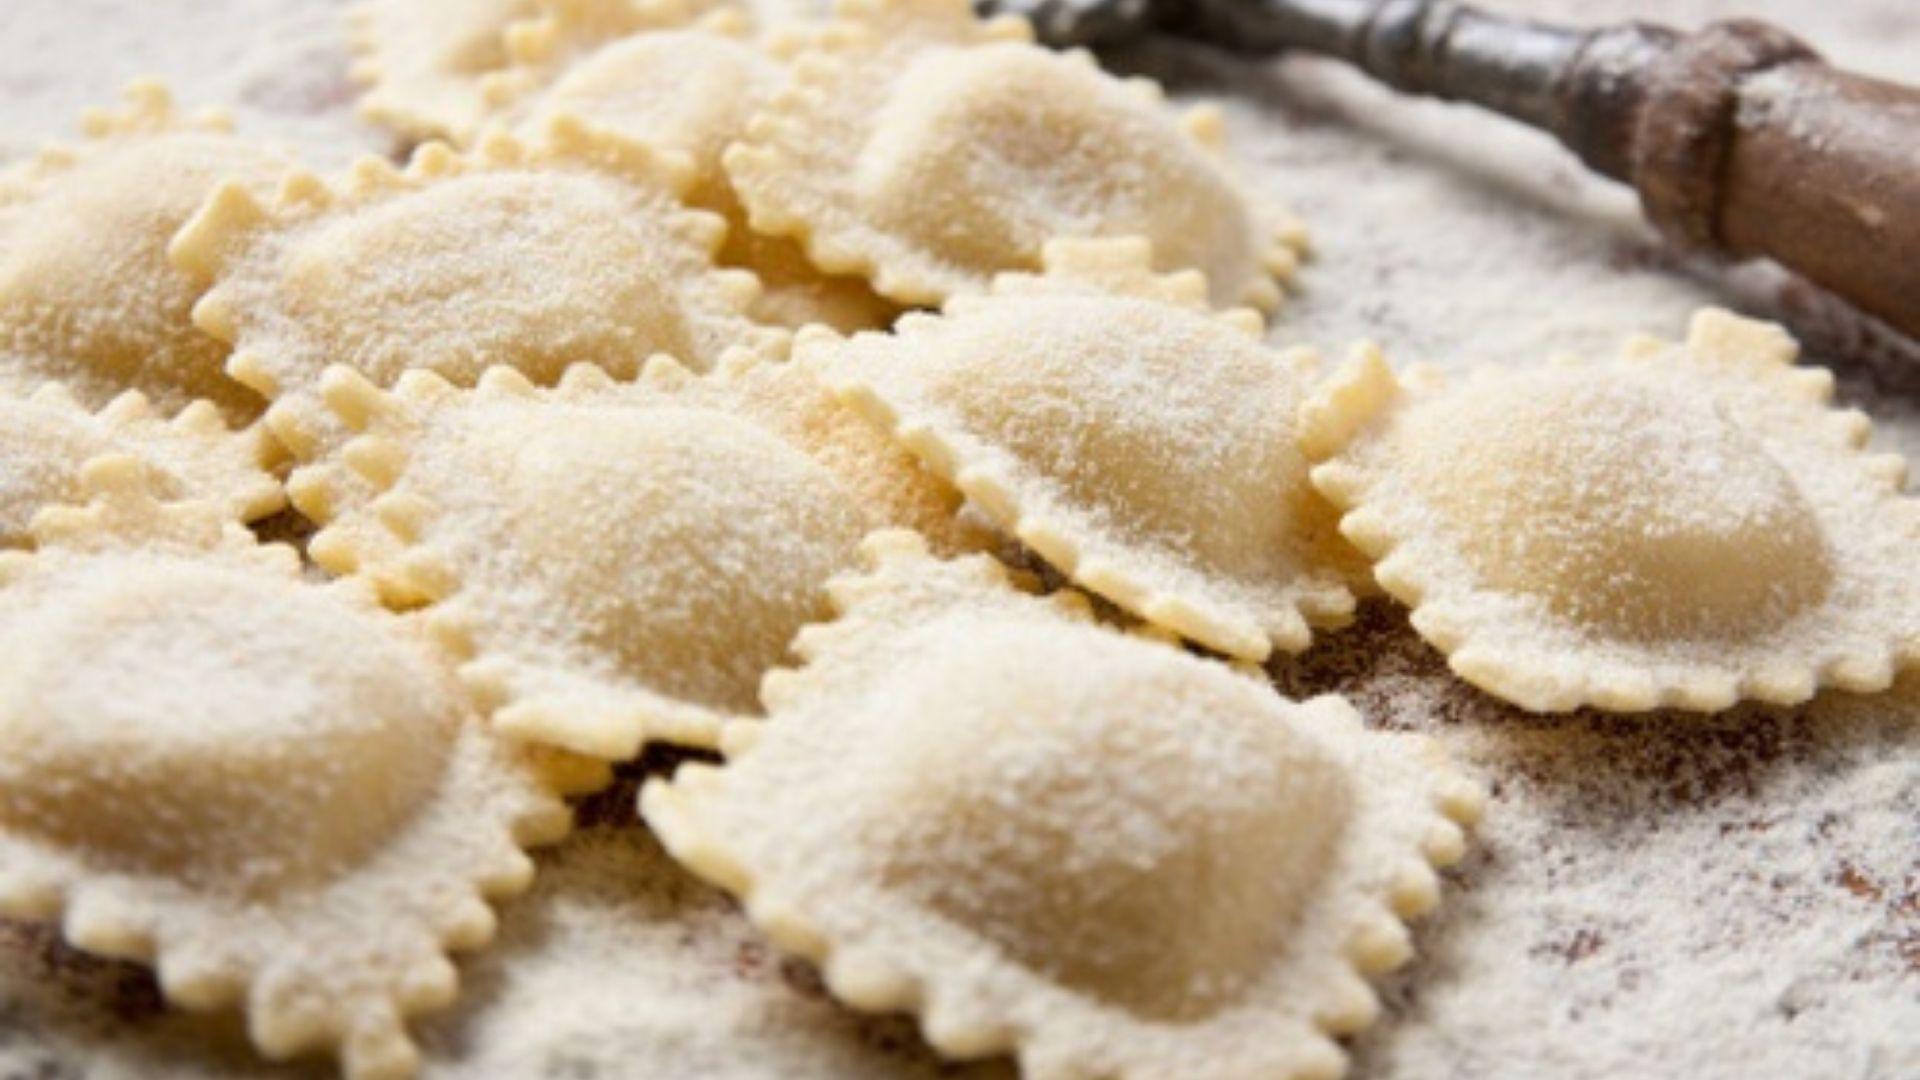 3 in 1 Cooking Class in Piazza Navona: Fettuccine Ravioli and Tiramisu